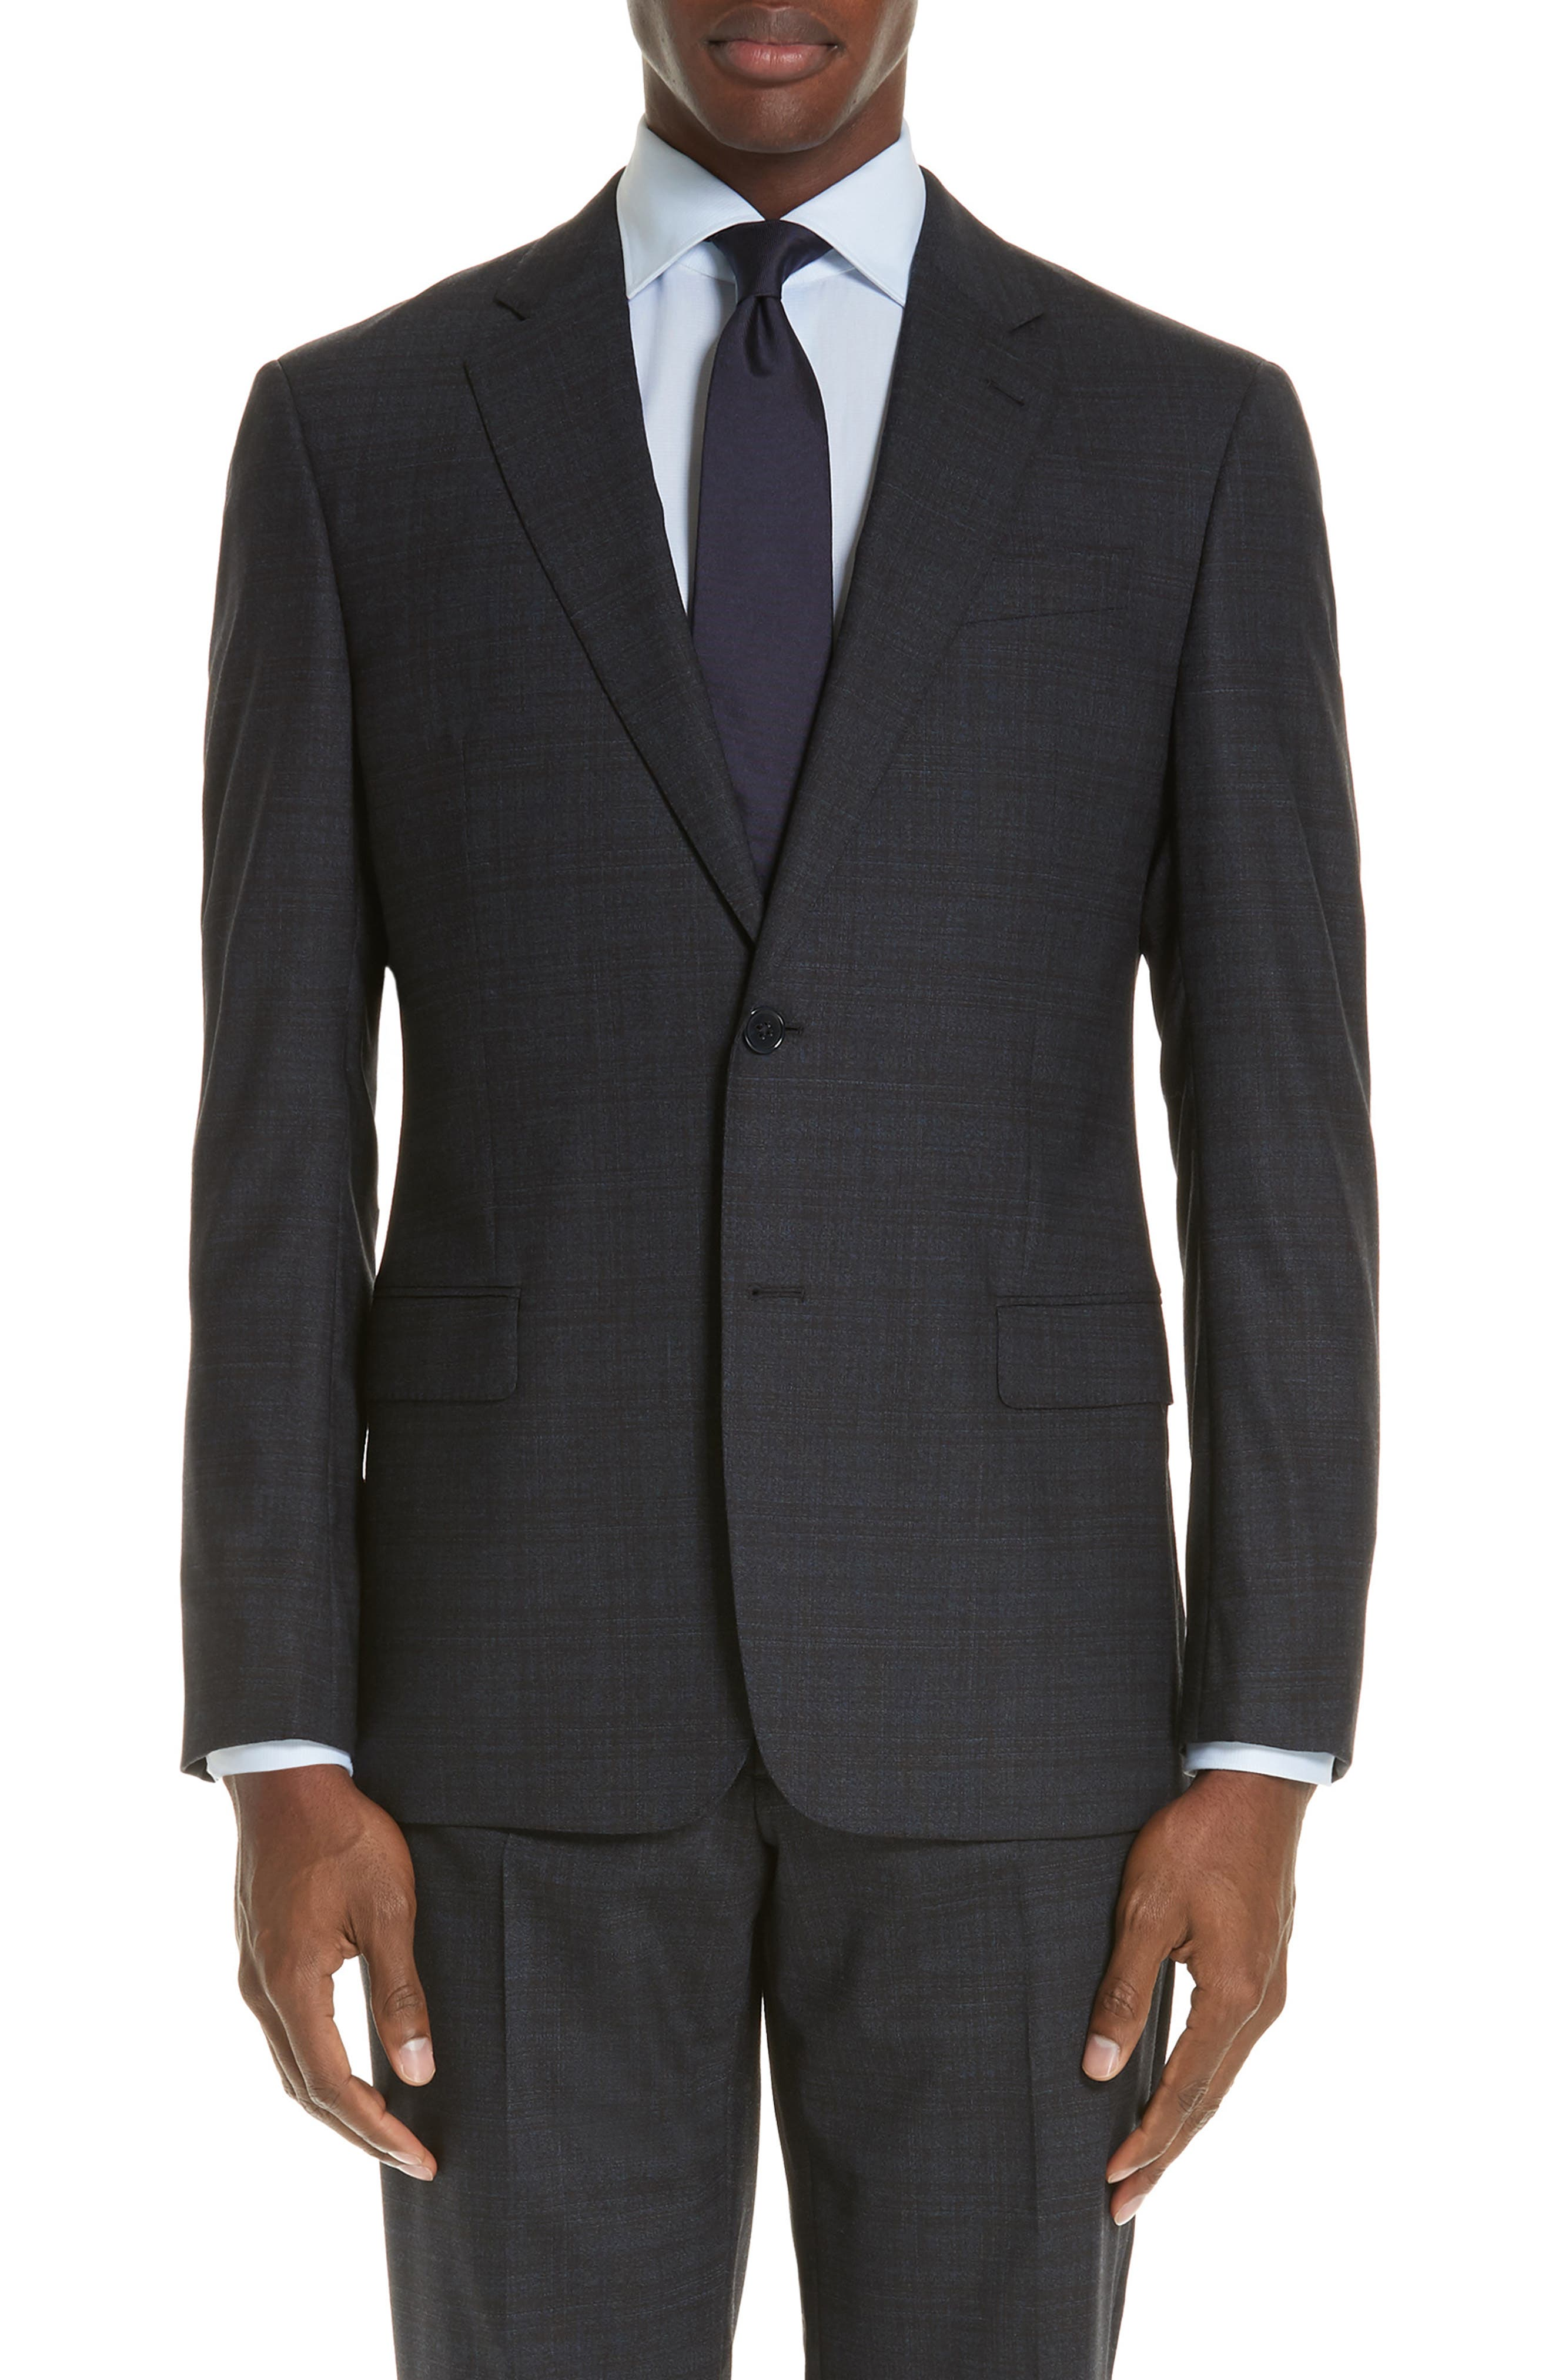 G-Line Trim Fit Stretch Plaid Wool Suit,                             Alternate thumbnail 5, color,                             NAVY/ BROWN